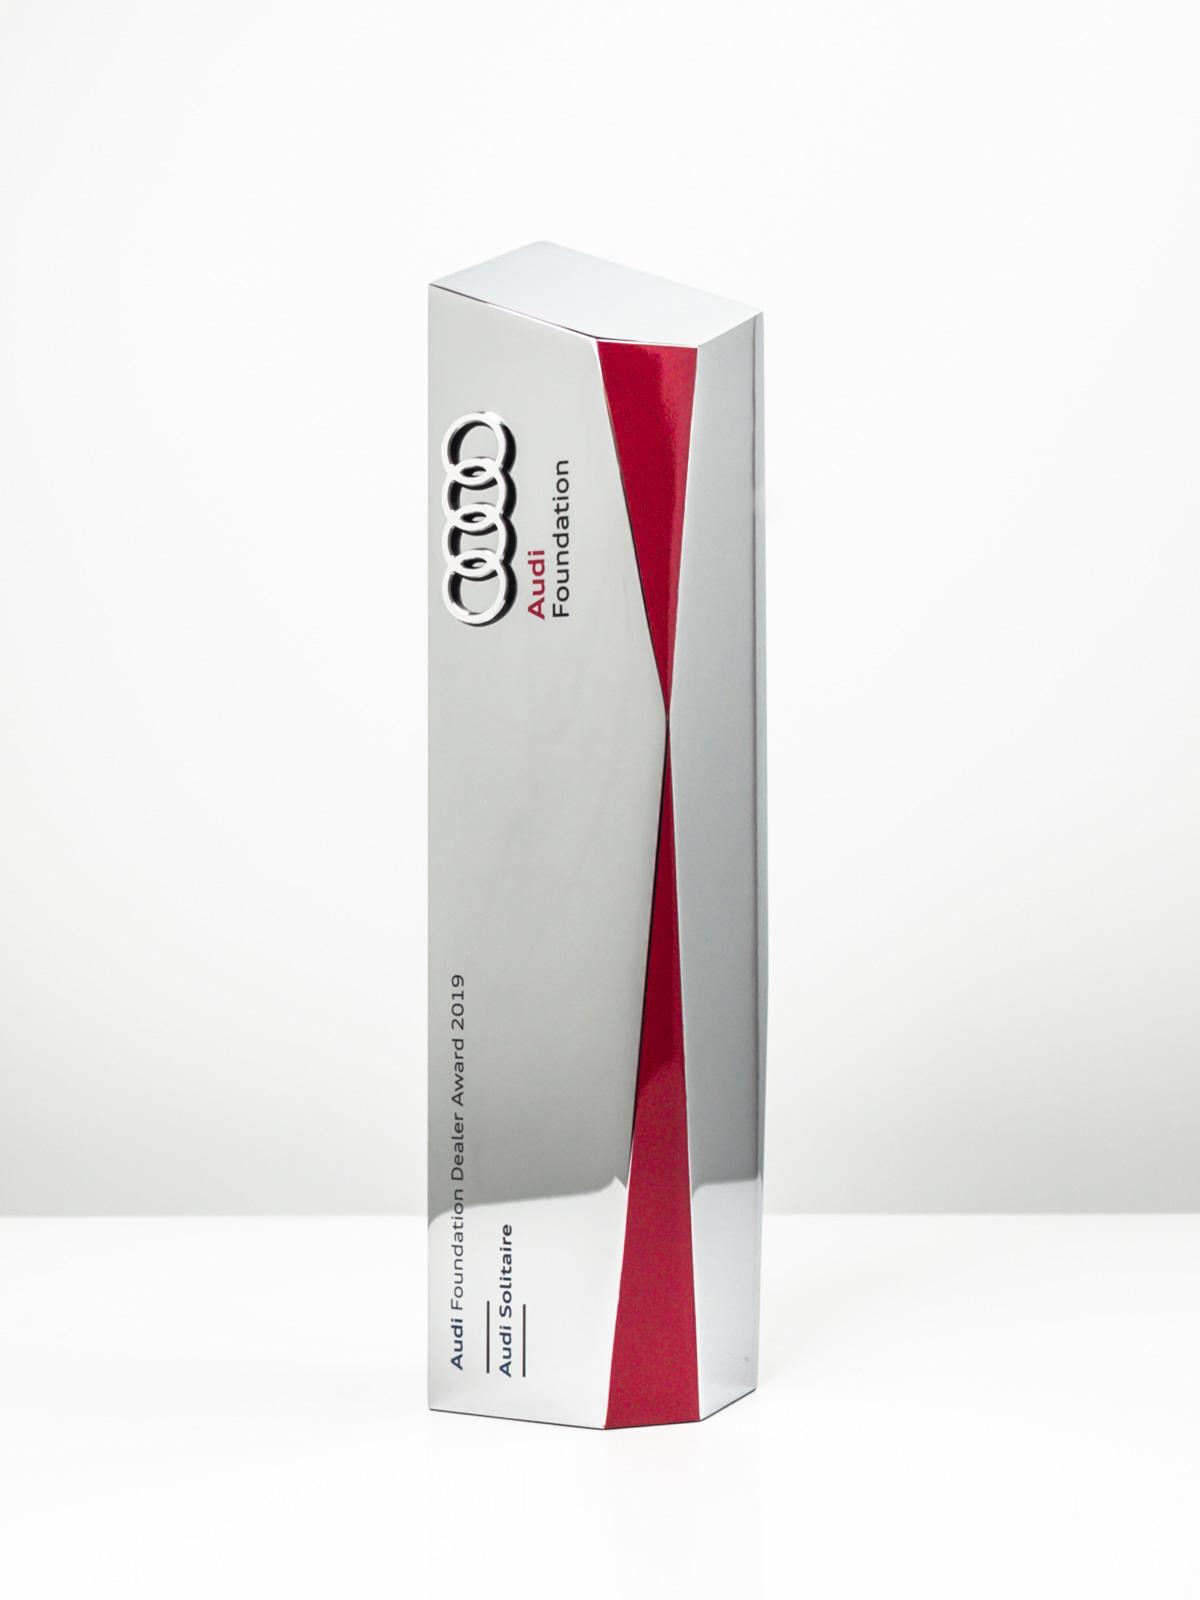 Audi Dealer of the Year Bespoke Award Trophy